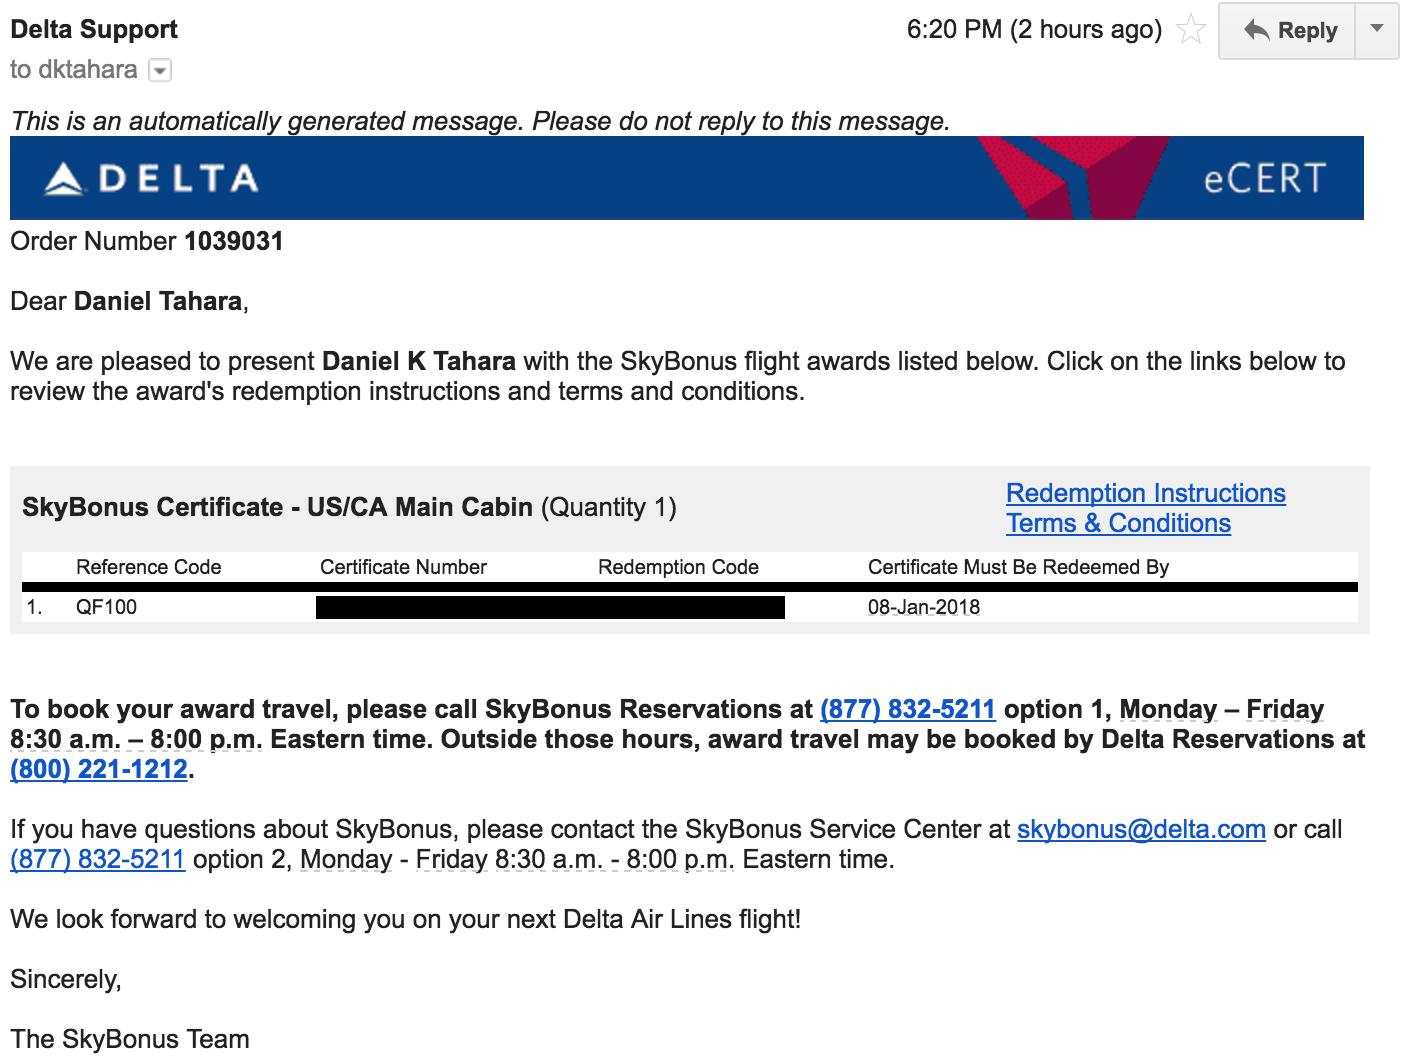 My Experience Booking a Delta Skybonus Award | DEM Flyers